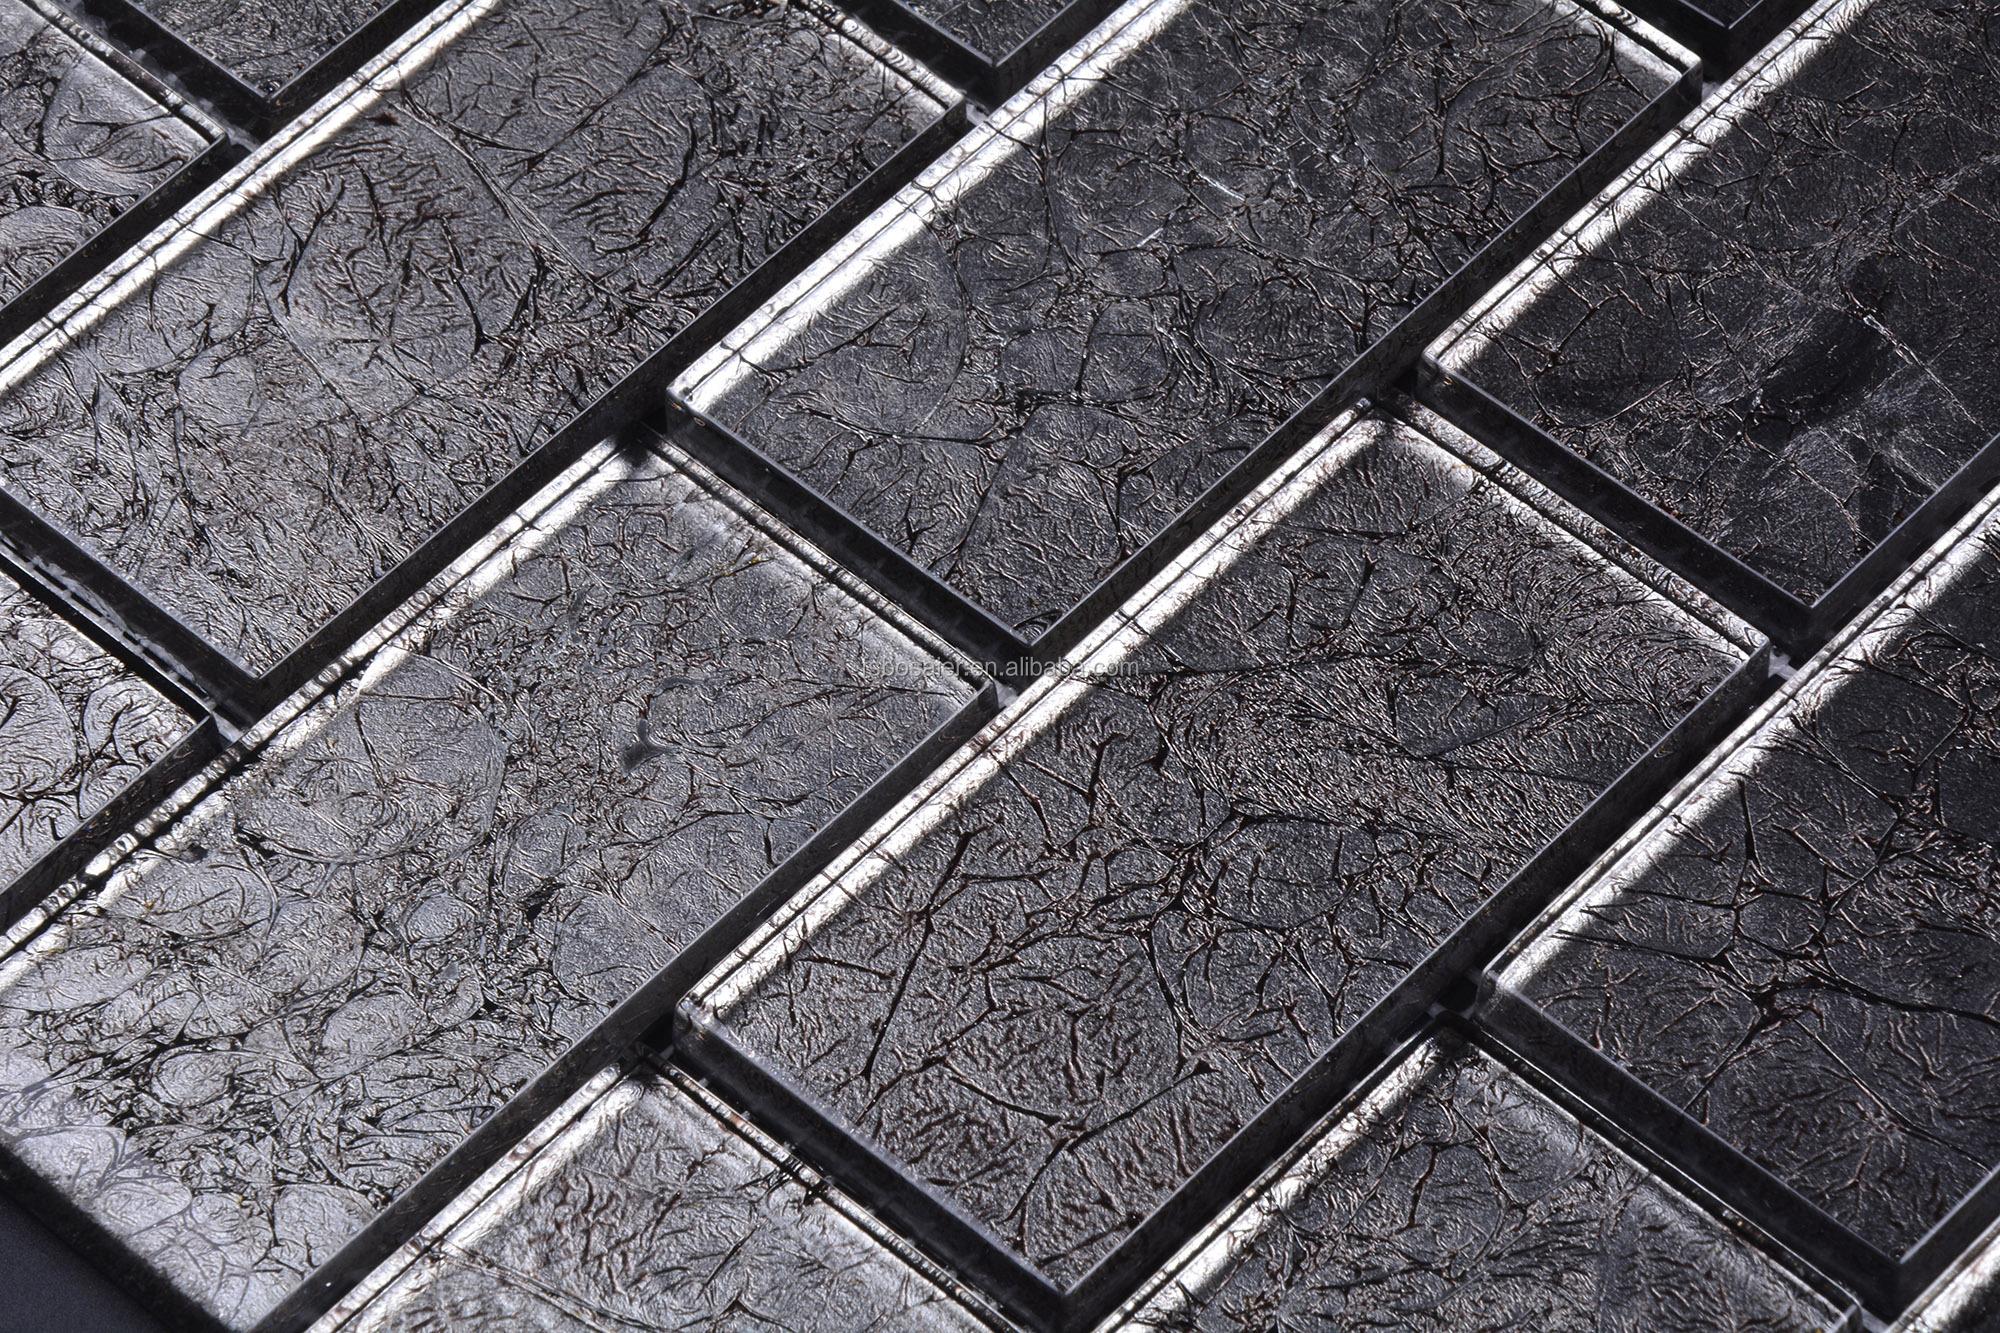 Bsl128 satinato lucido crystal clear metropolitana foglia argento 3d